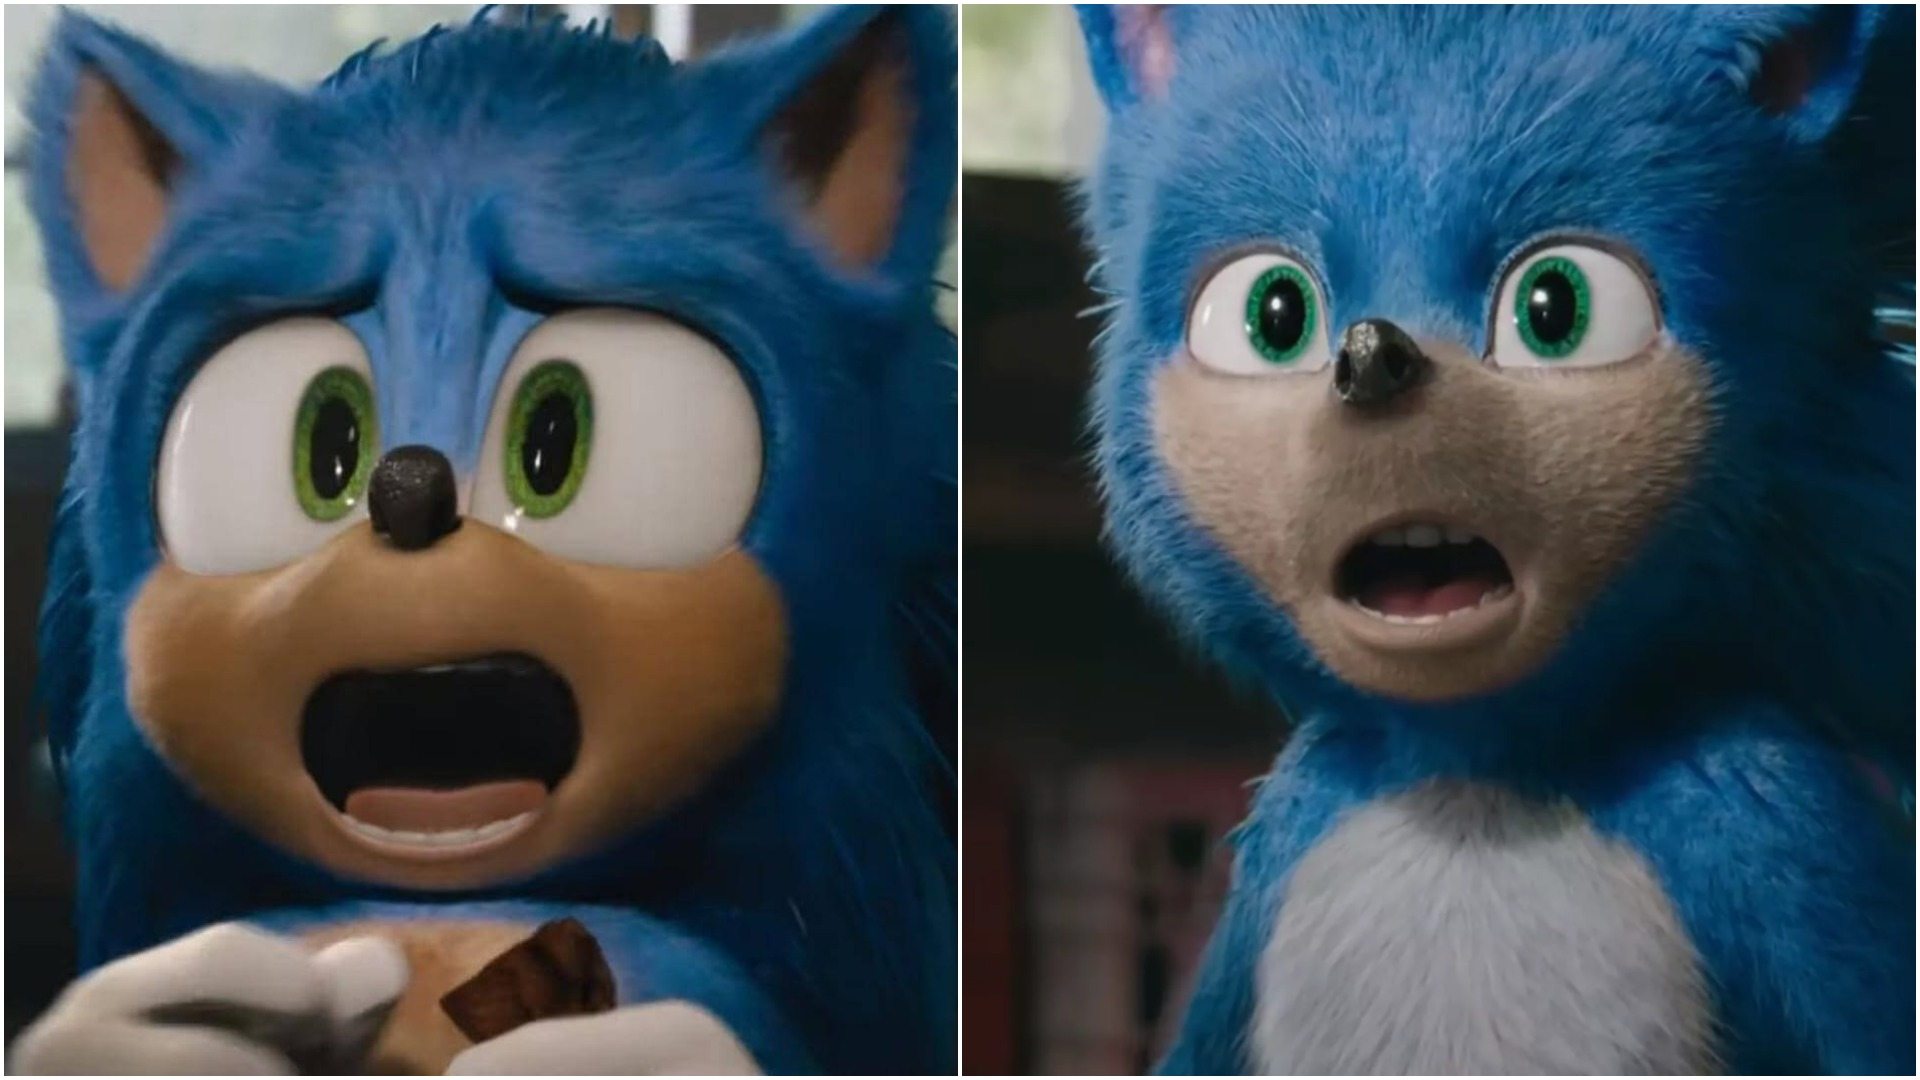 Sonic the hedgehog movie CGI change